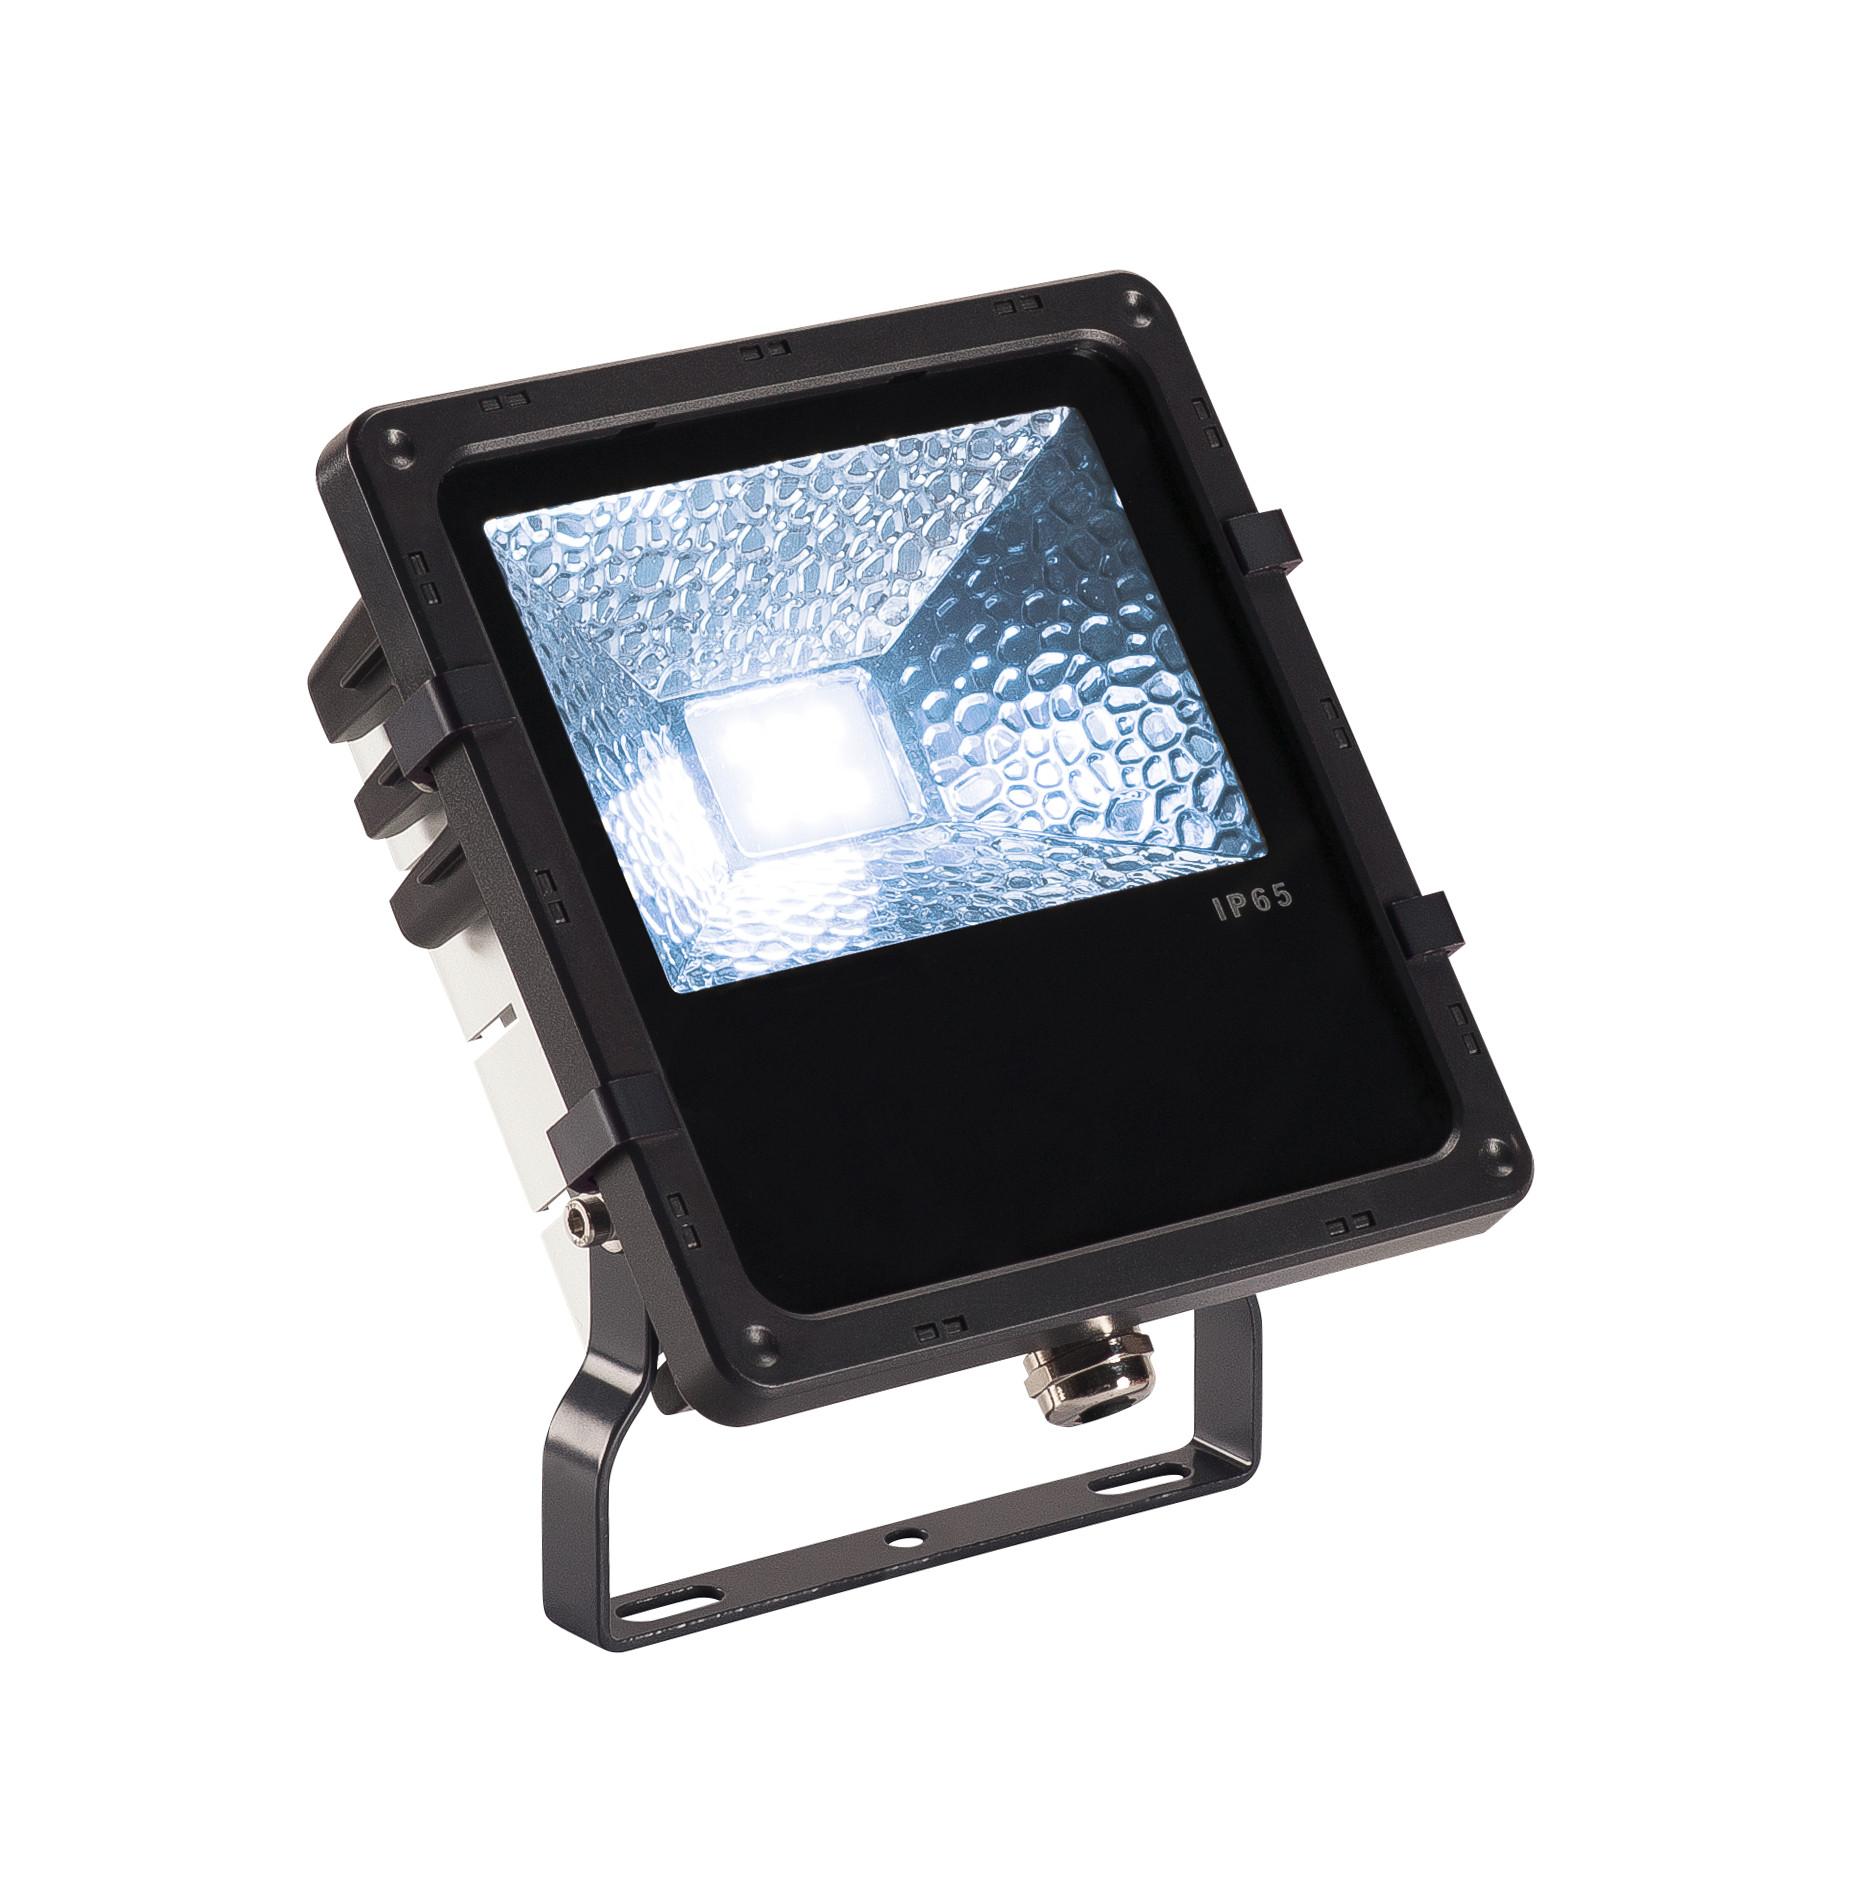 1 Stk DISOS, Outdoor Strahler, LED, 4000K, schwarz, 25W LI232360--